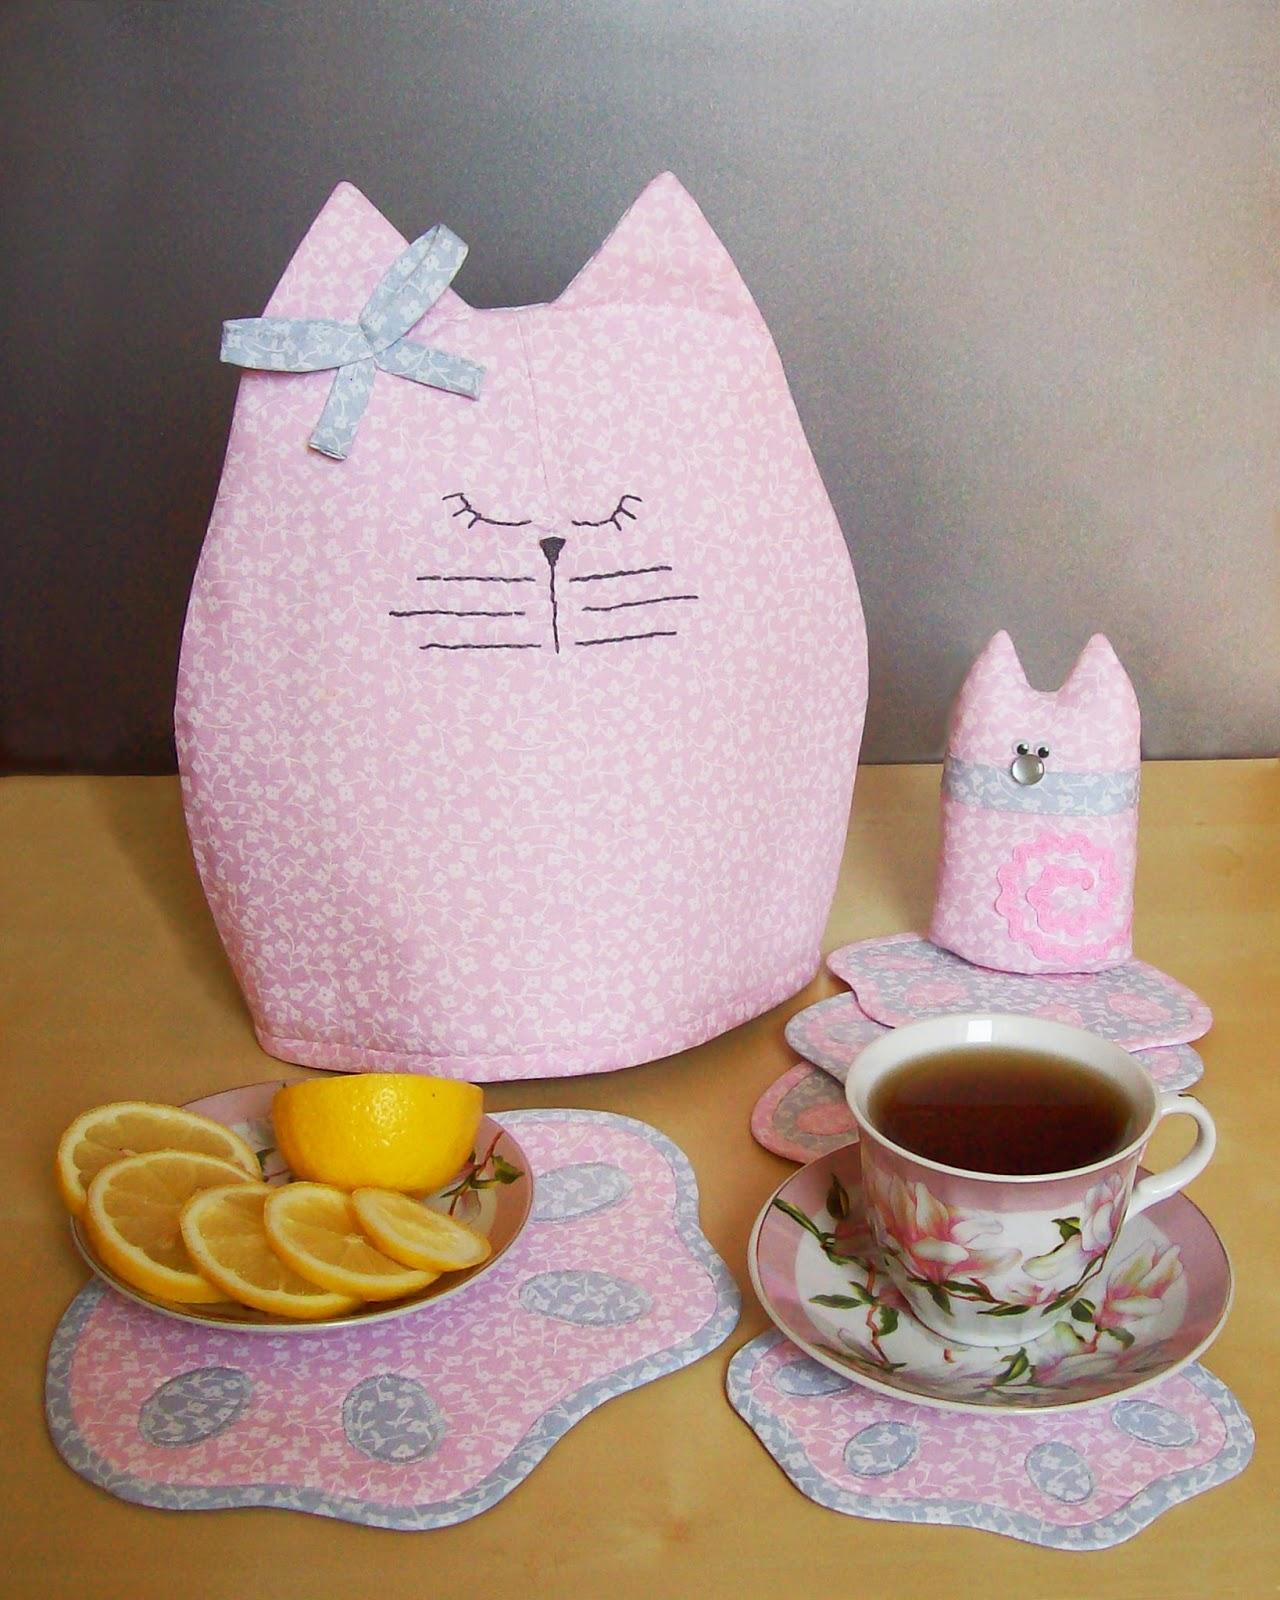 мама кошечка и котёночек (грелка на чайник, игрушка и подставки под горячее)